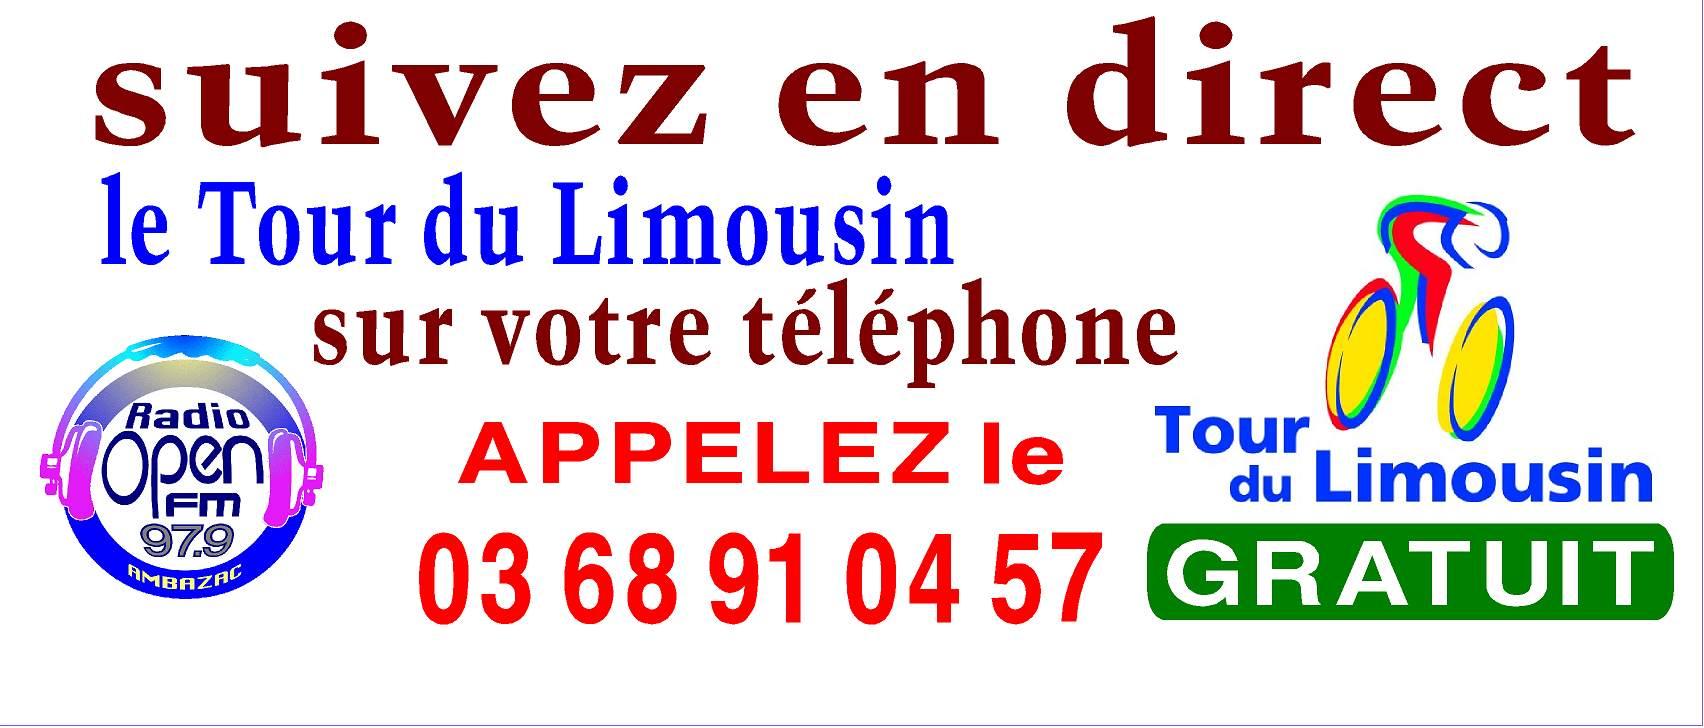 ecoute_telephone01.jpg